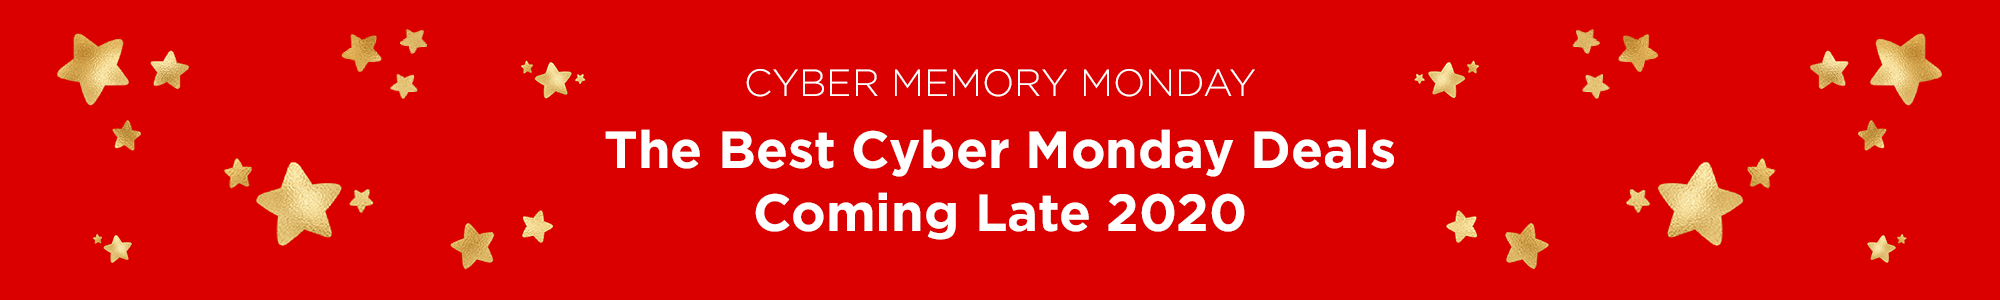 Cyber Monday Deals 2020